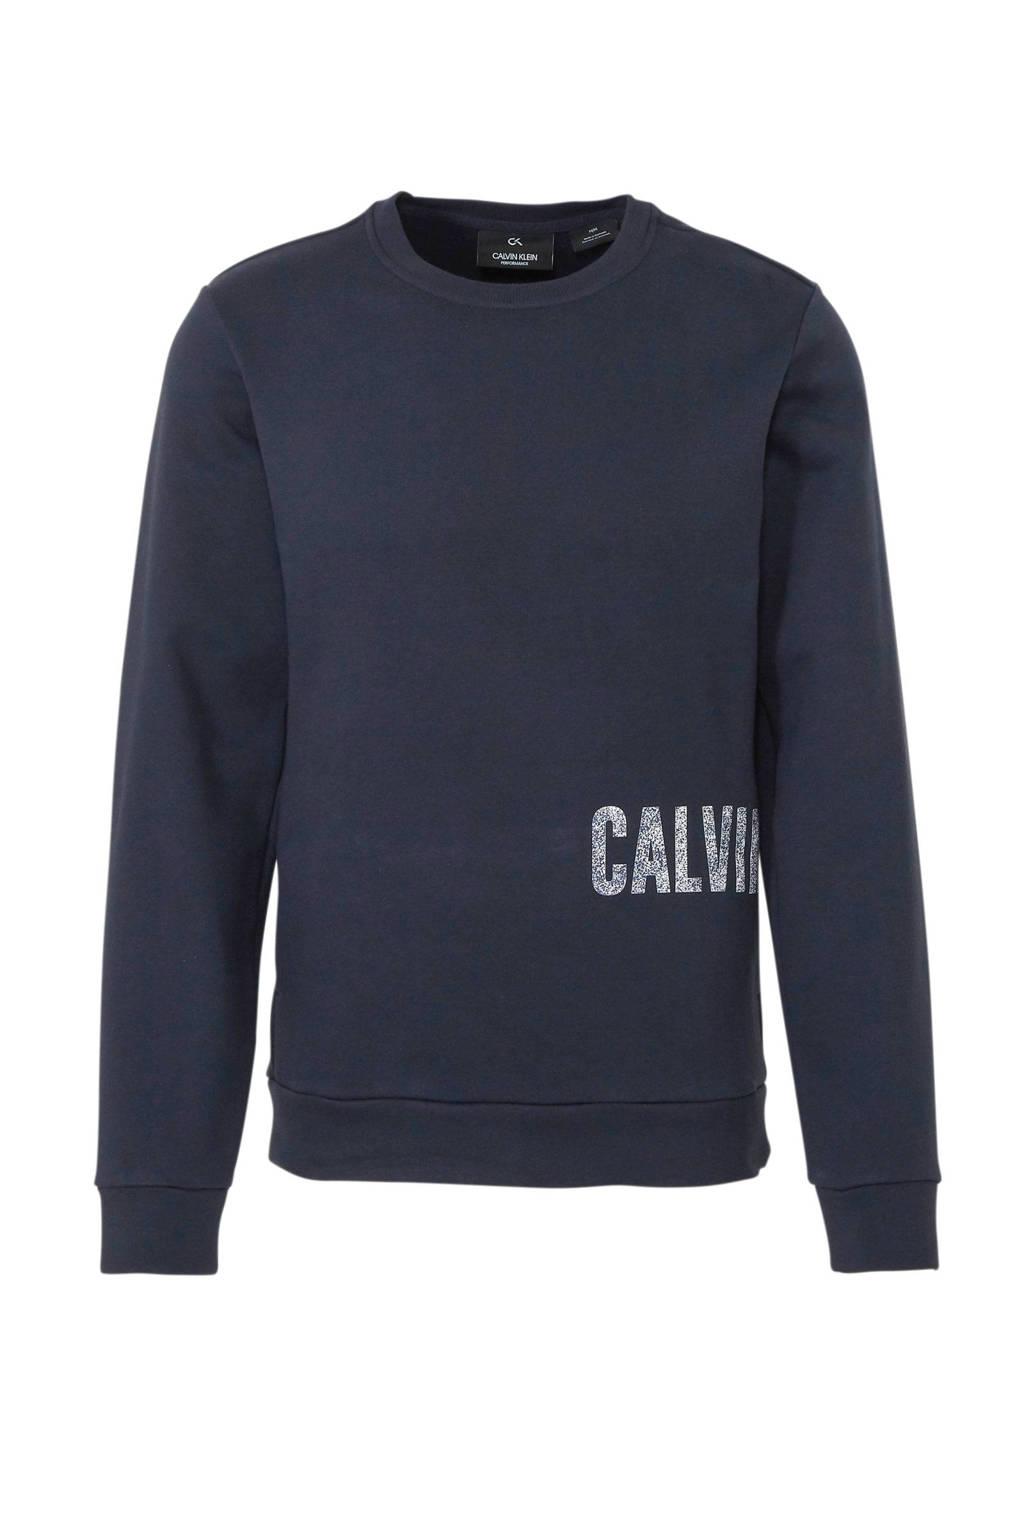 CALVIN KLEIN PERFORMANCE   sweater donkerblauw, Donkerblauw